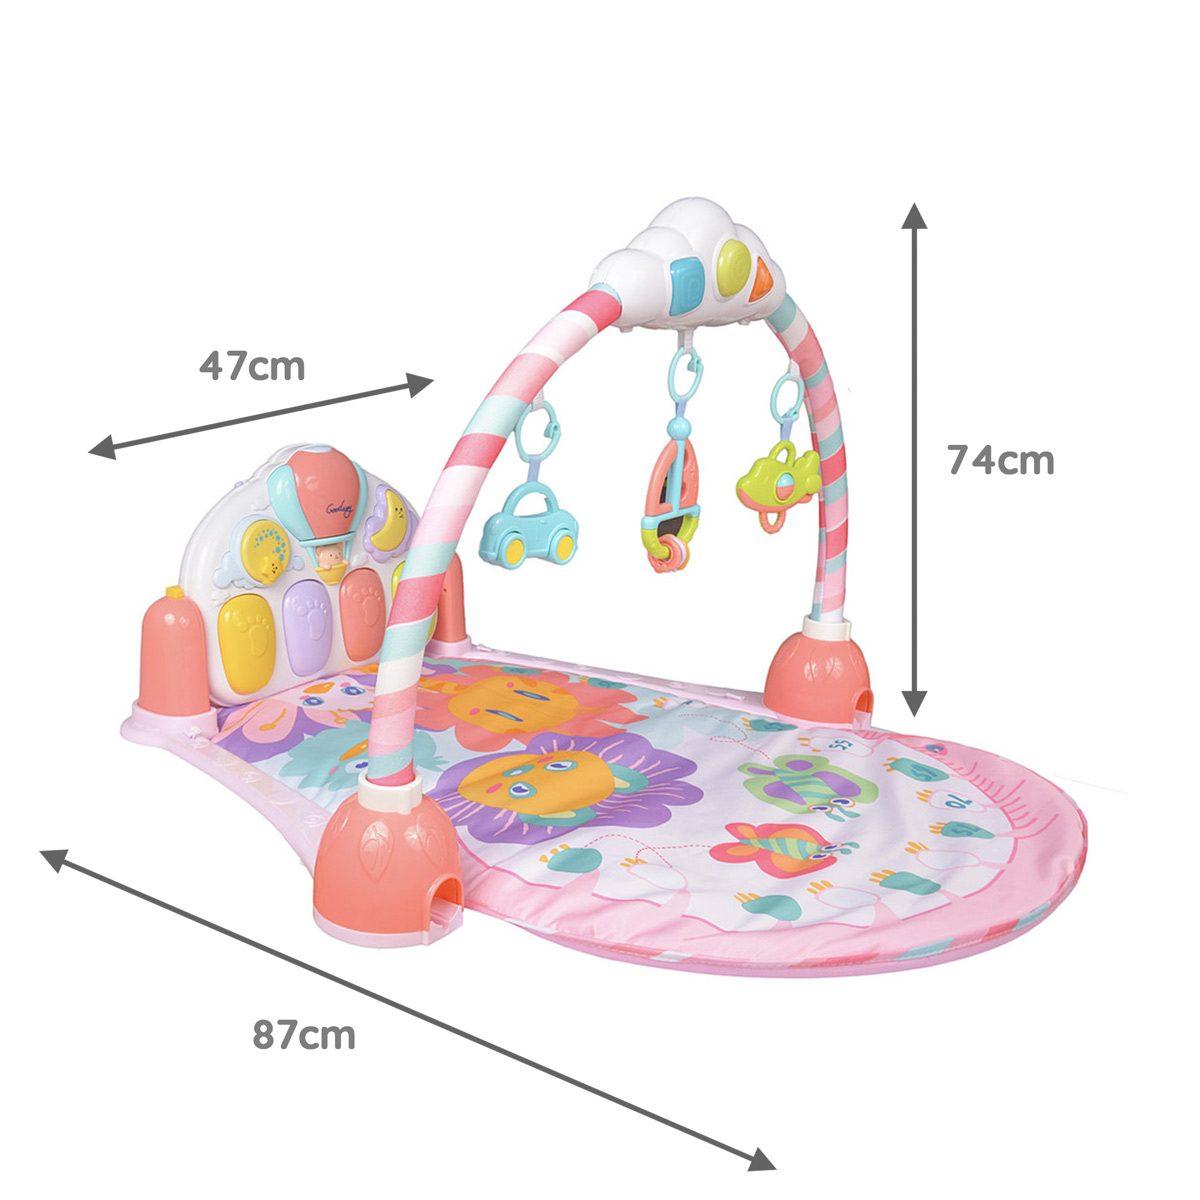 Mini Me & friends Pink Activity Mat Dimensions